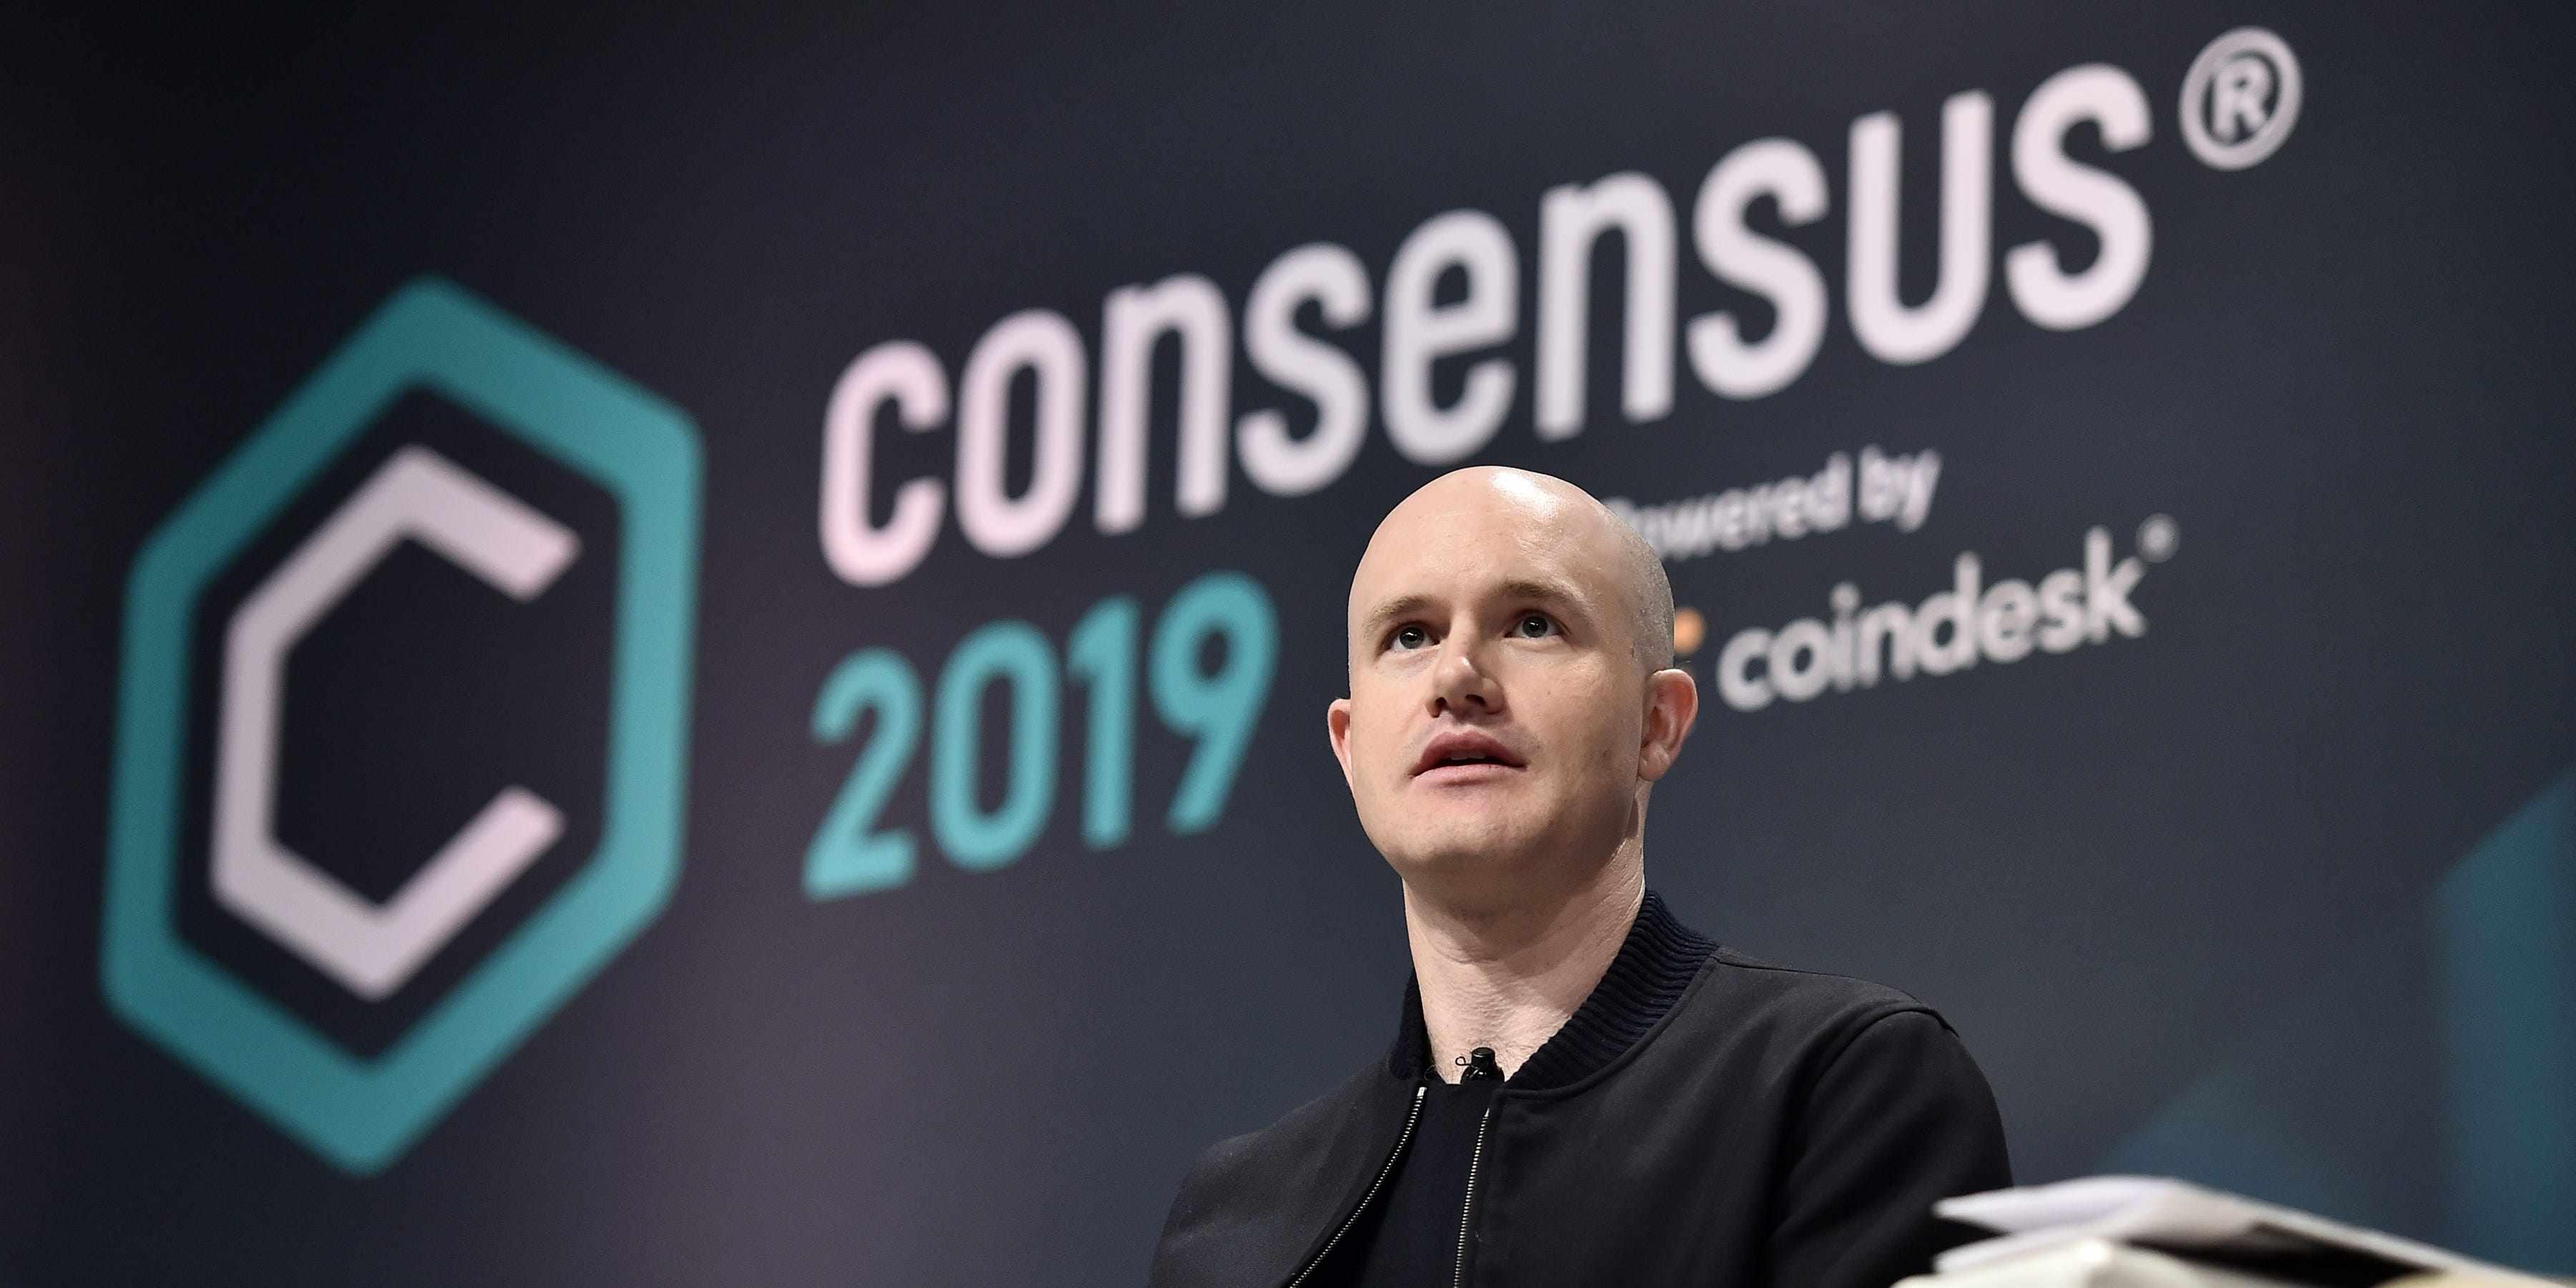 davidson coinbase blockbuster earnings ideal